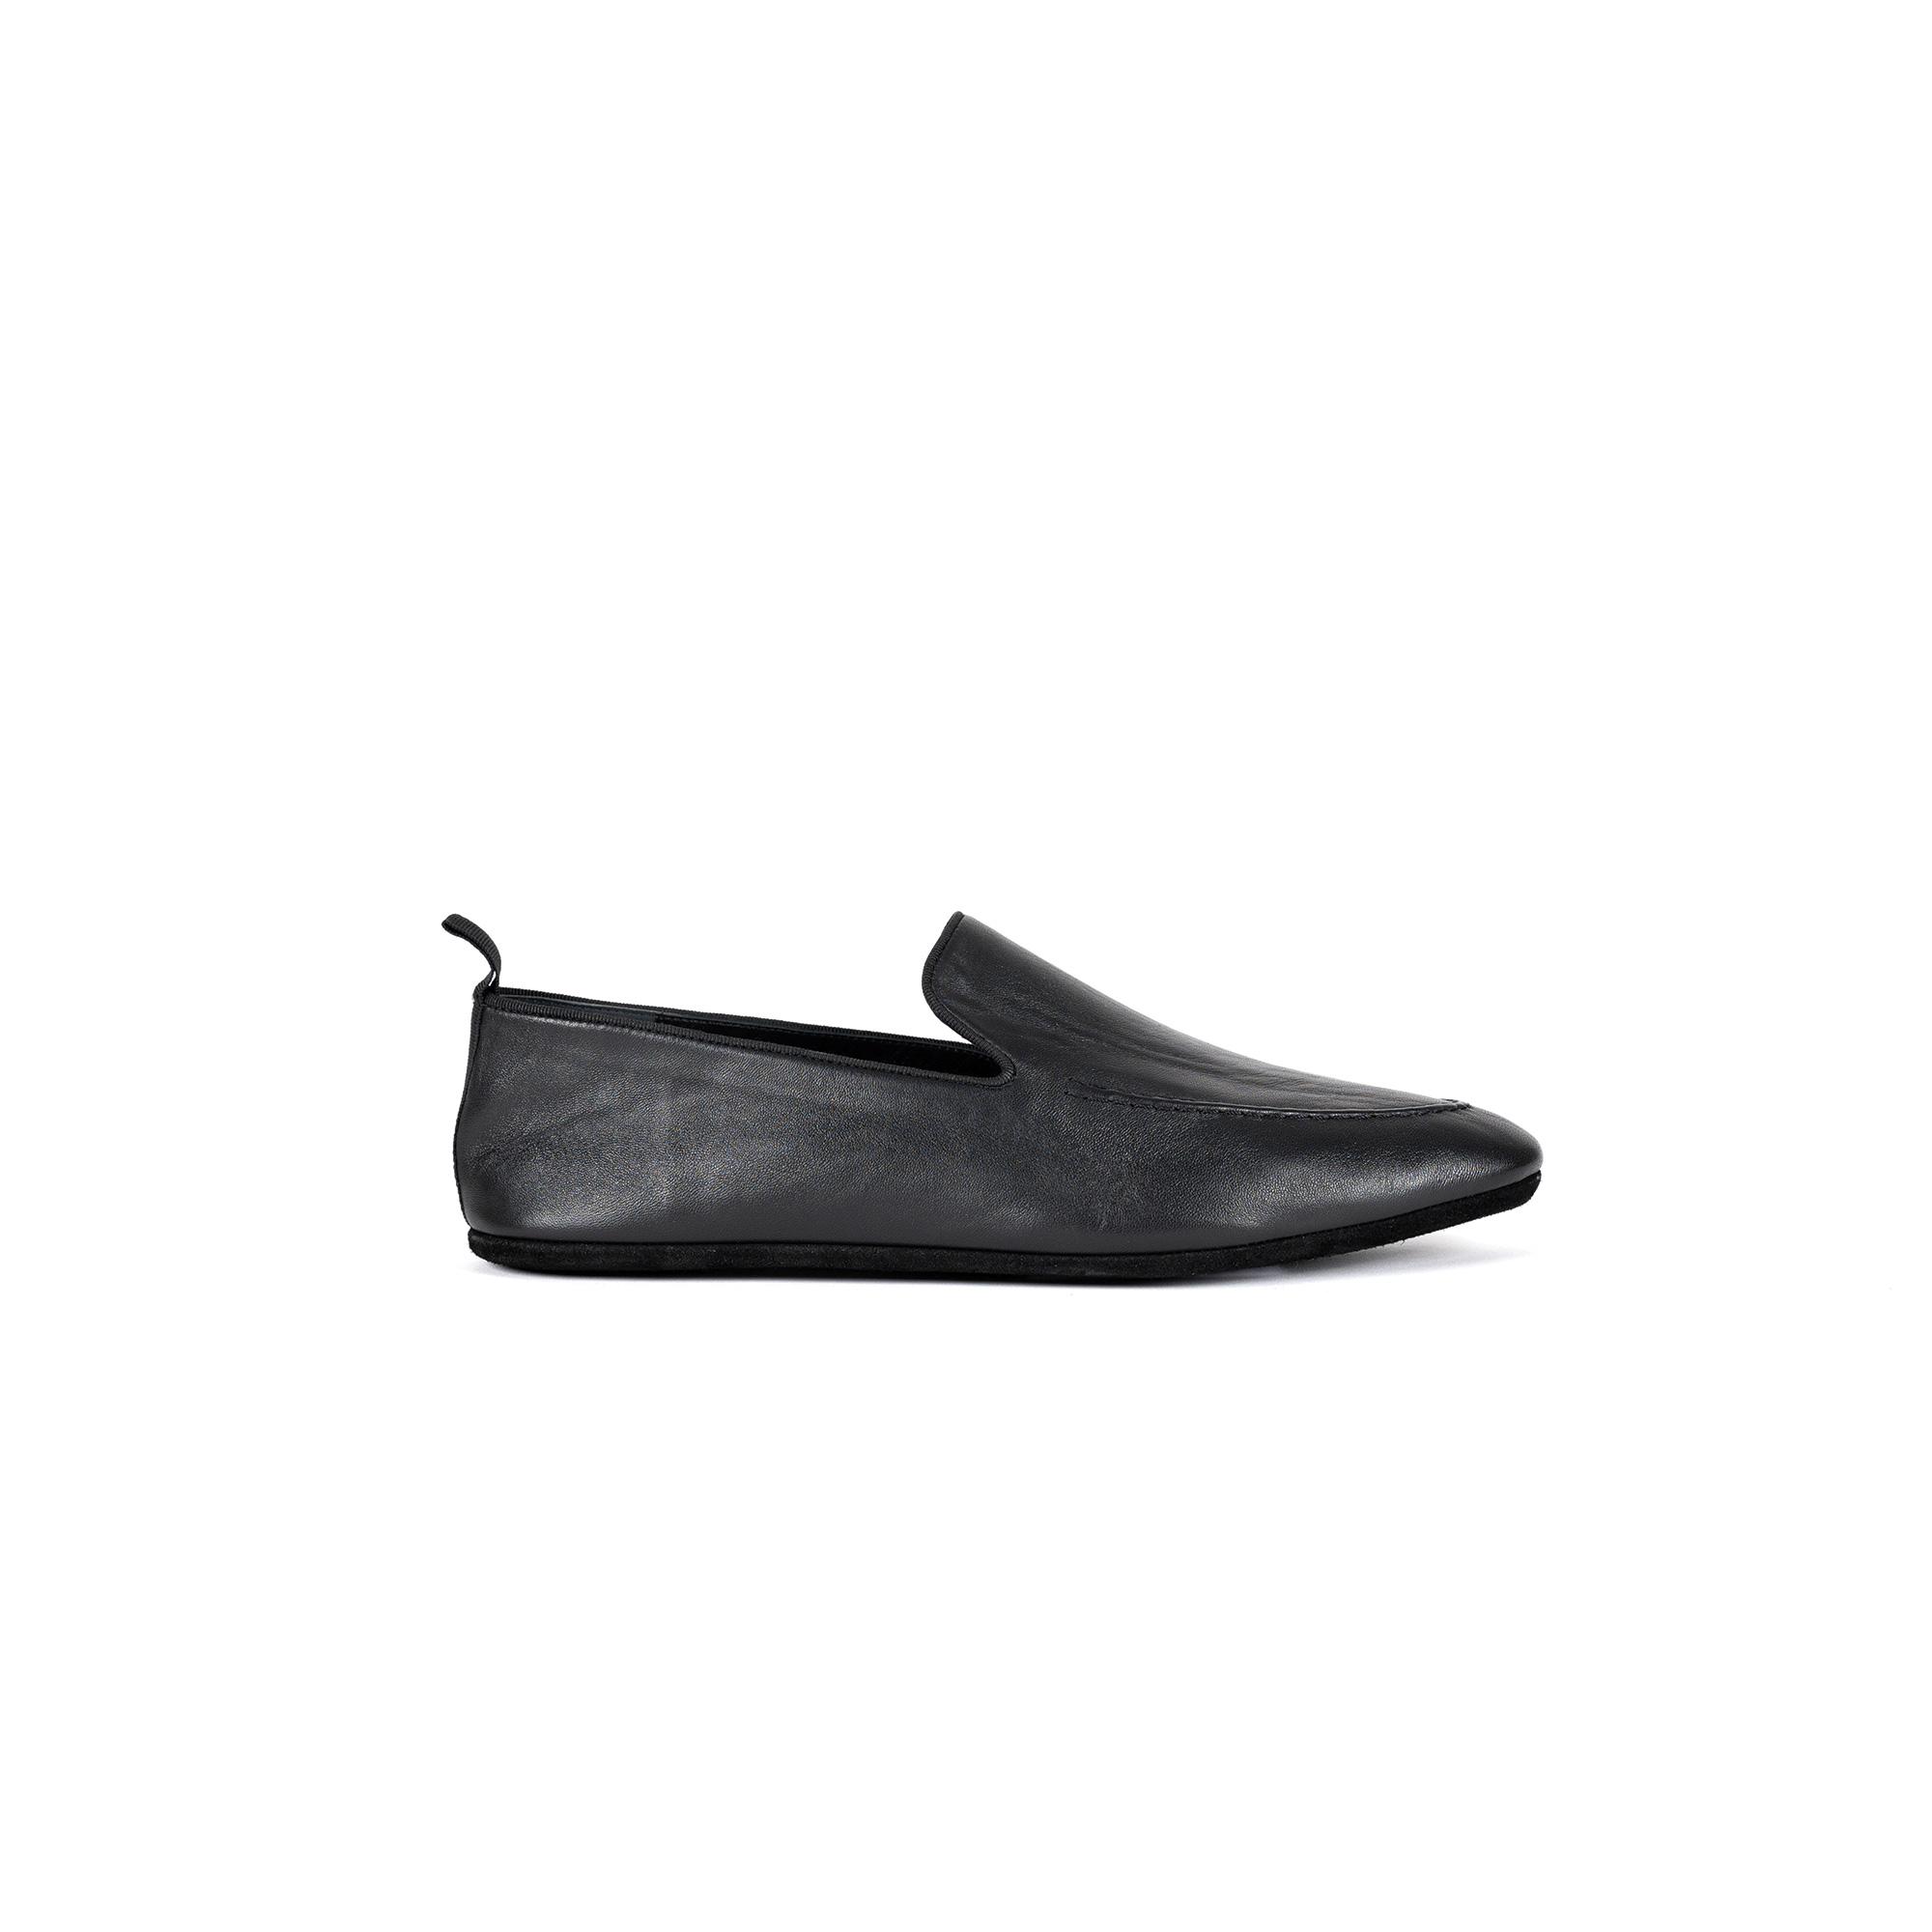 Indoor classic slipper in napa leather - Farfalla italian slippers